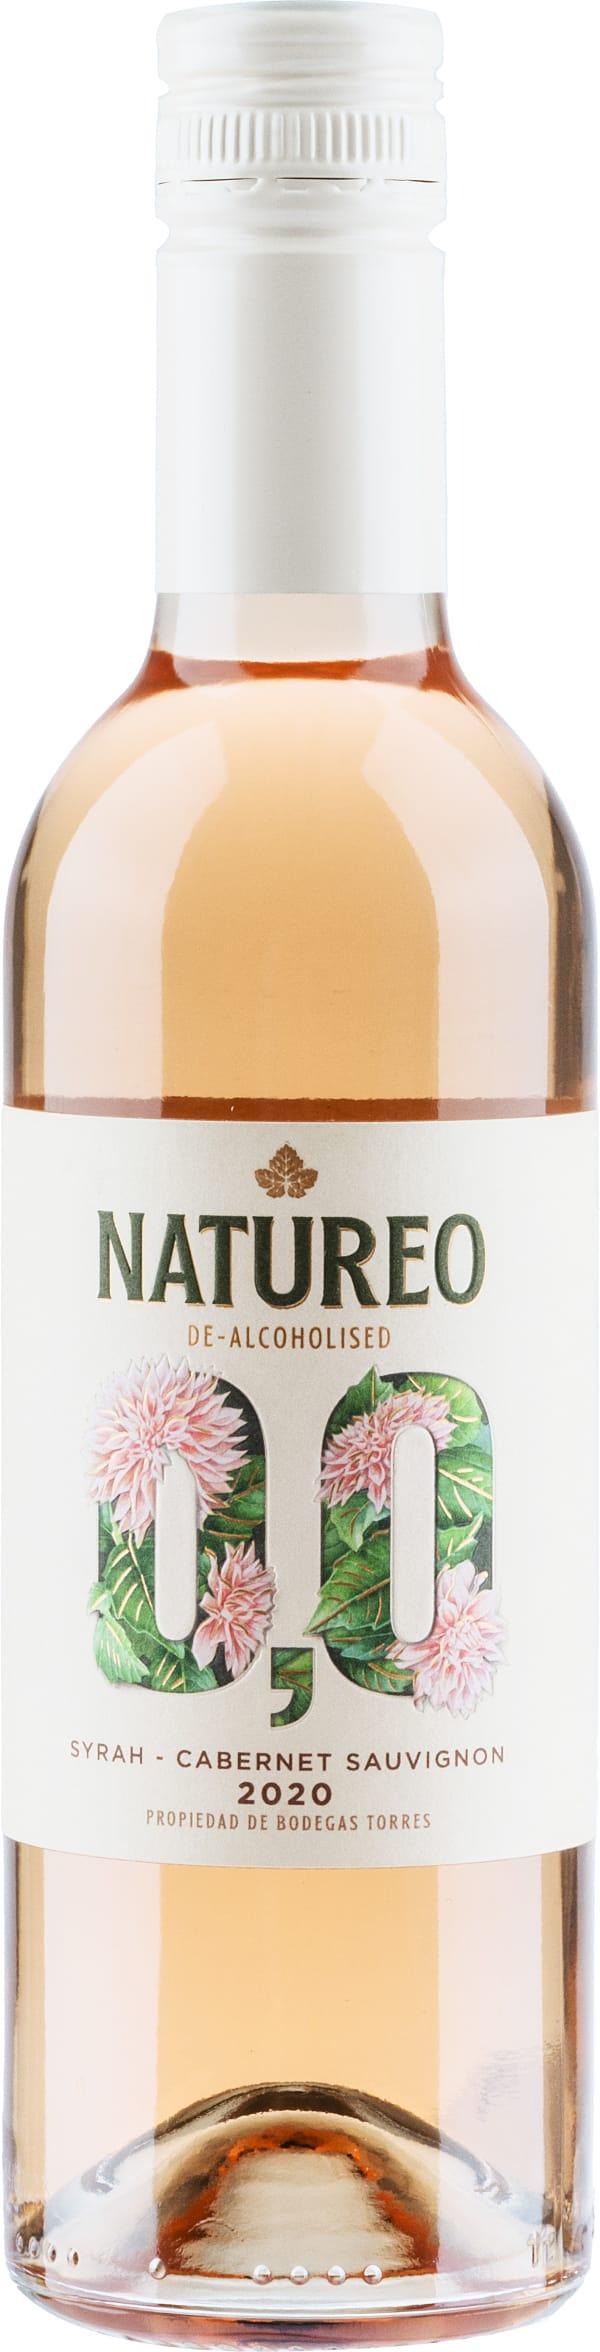 Torres Natureo Rosé 2015